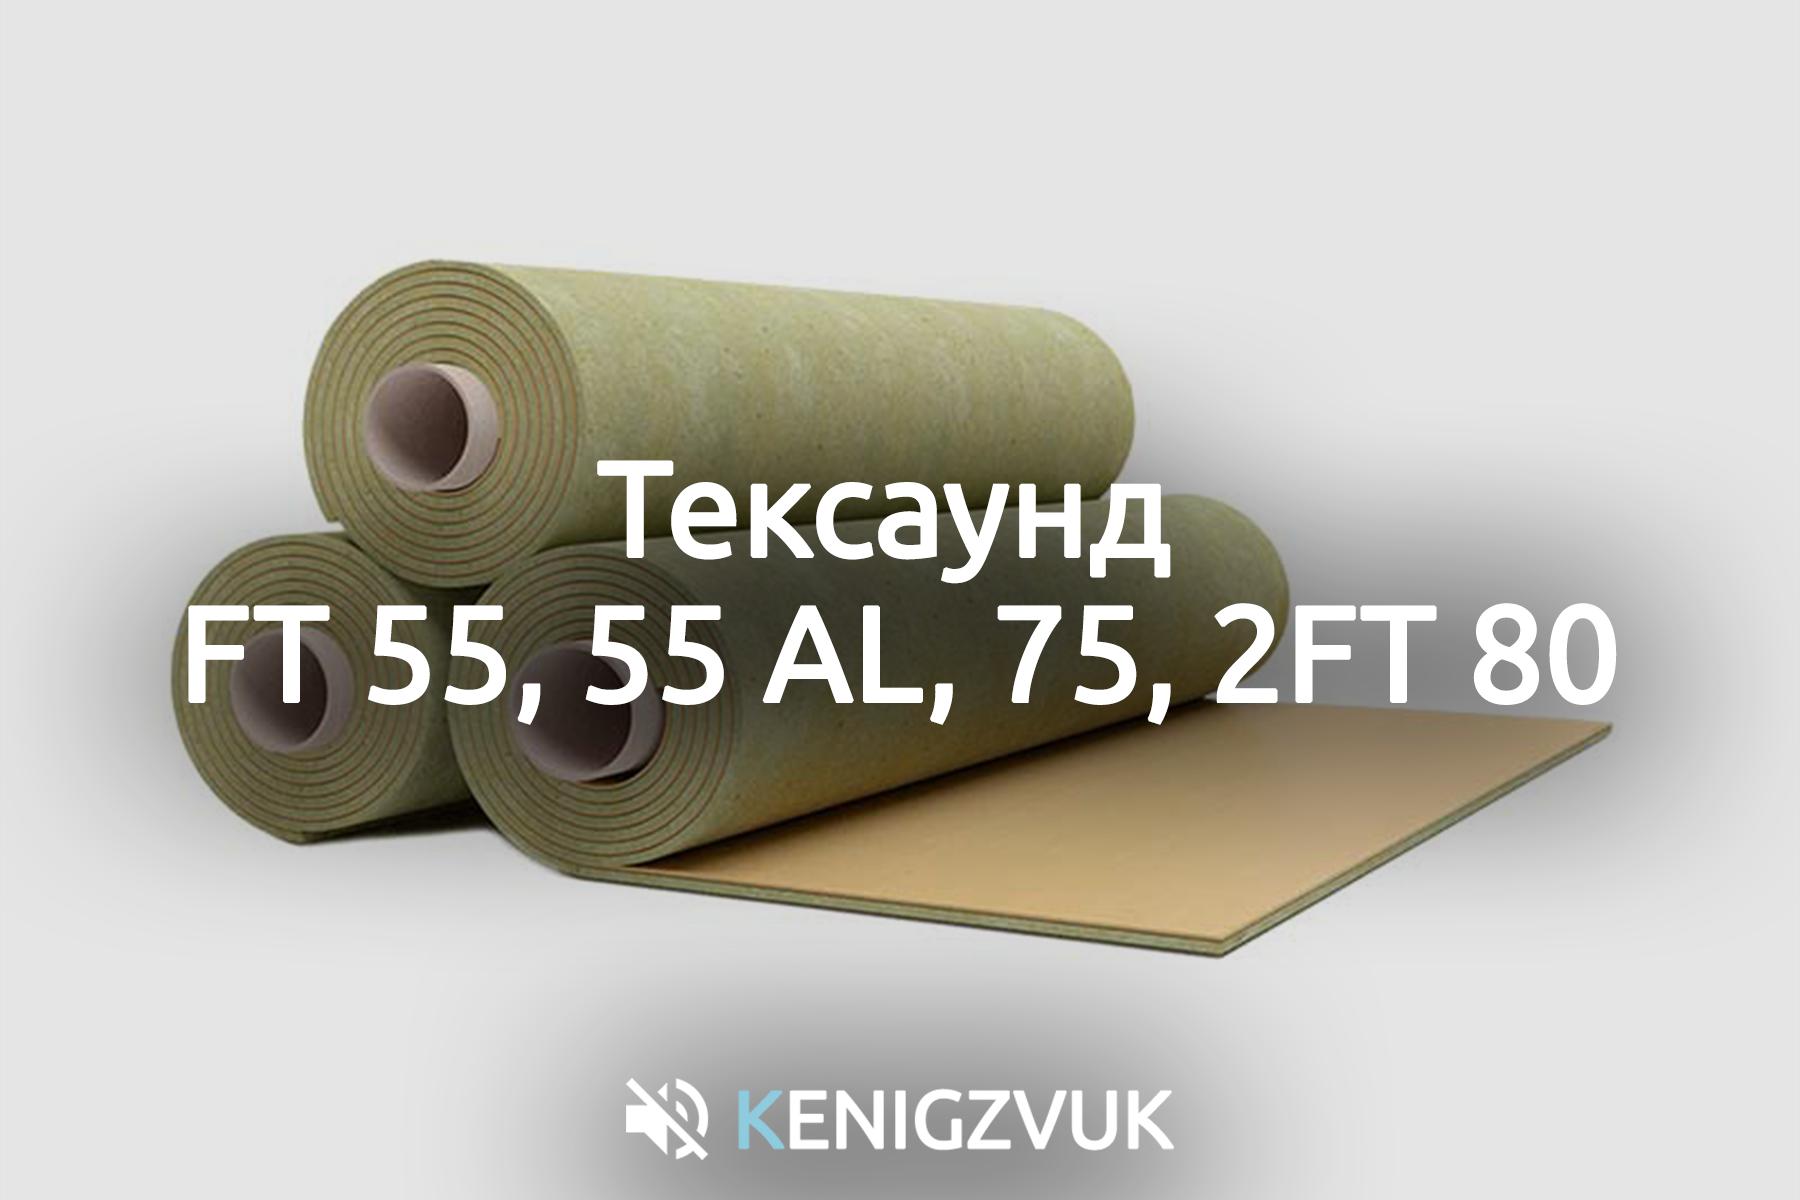 KenigZvuk   Звукоизоляция Калининград - Звукоизоляционная мембрана Тексаунд FT 55, 55 AL, 75, 2FT 80